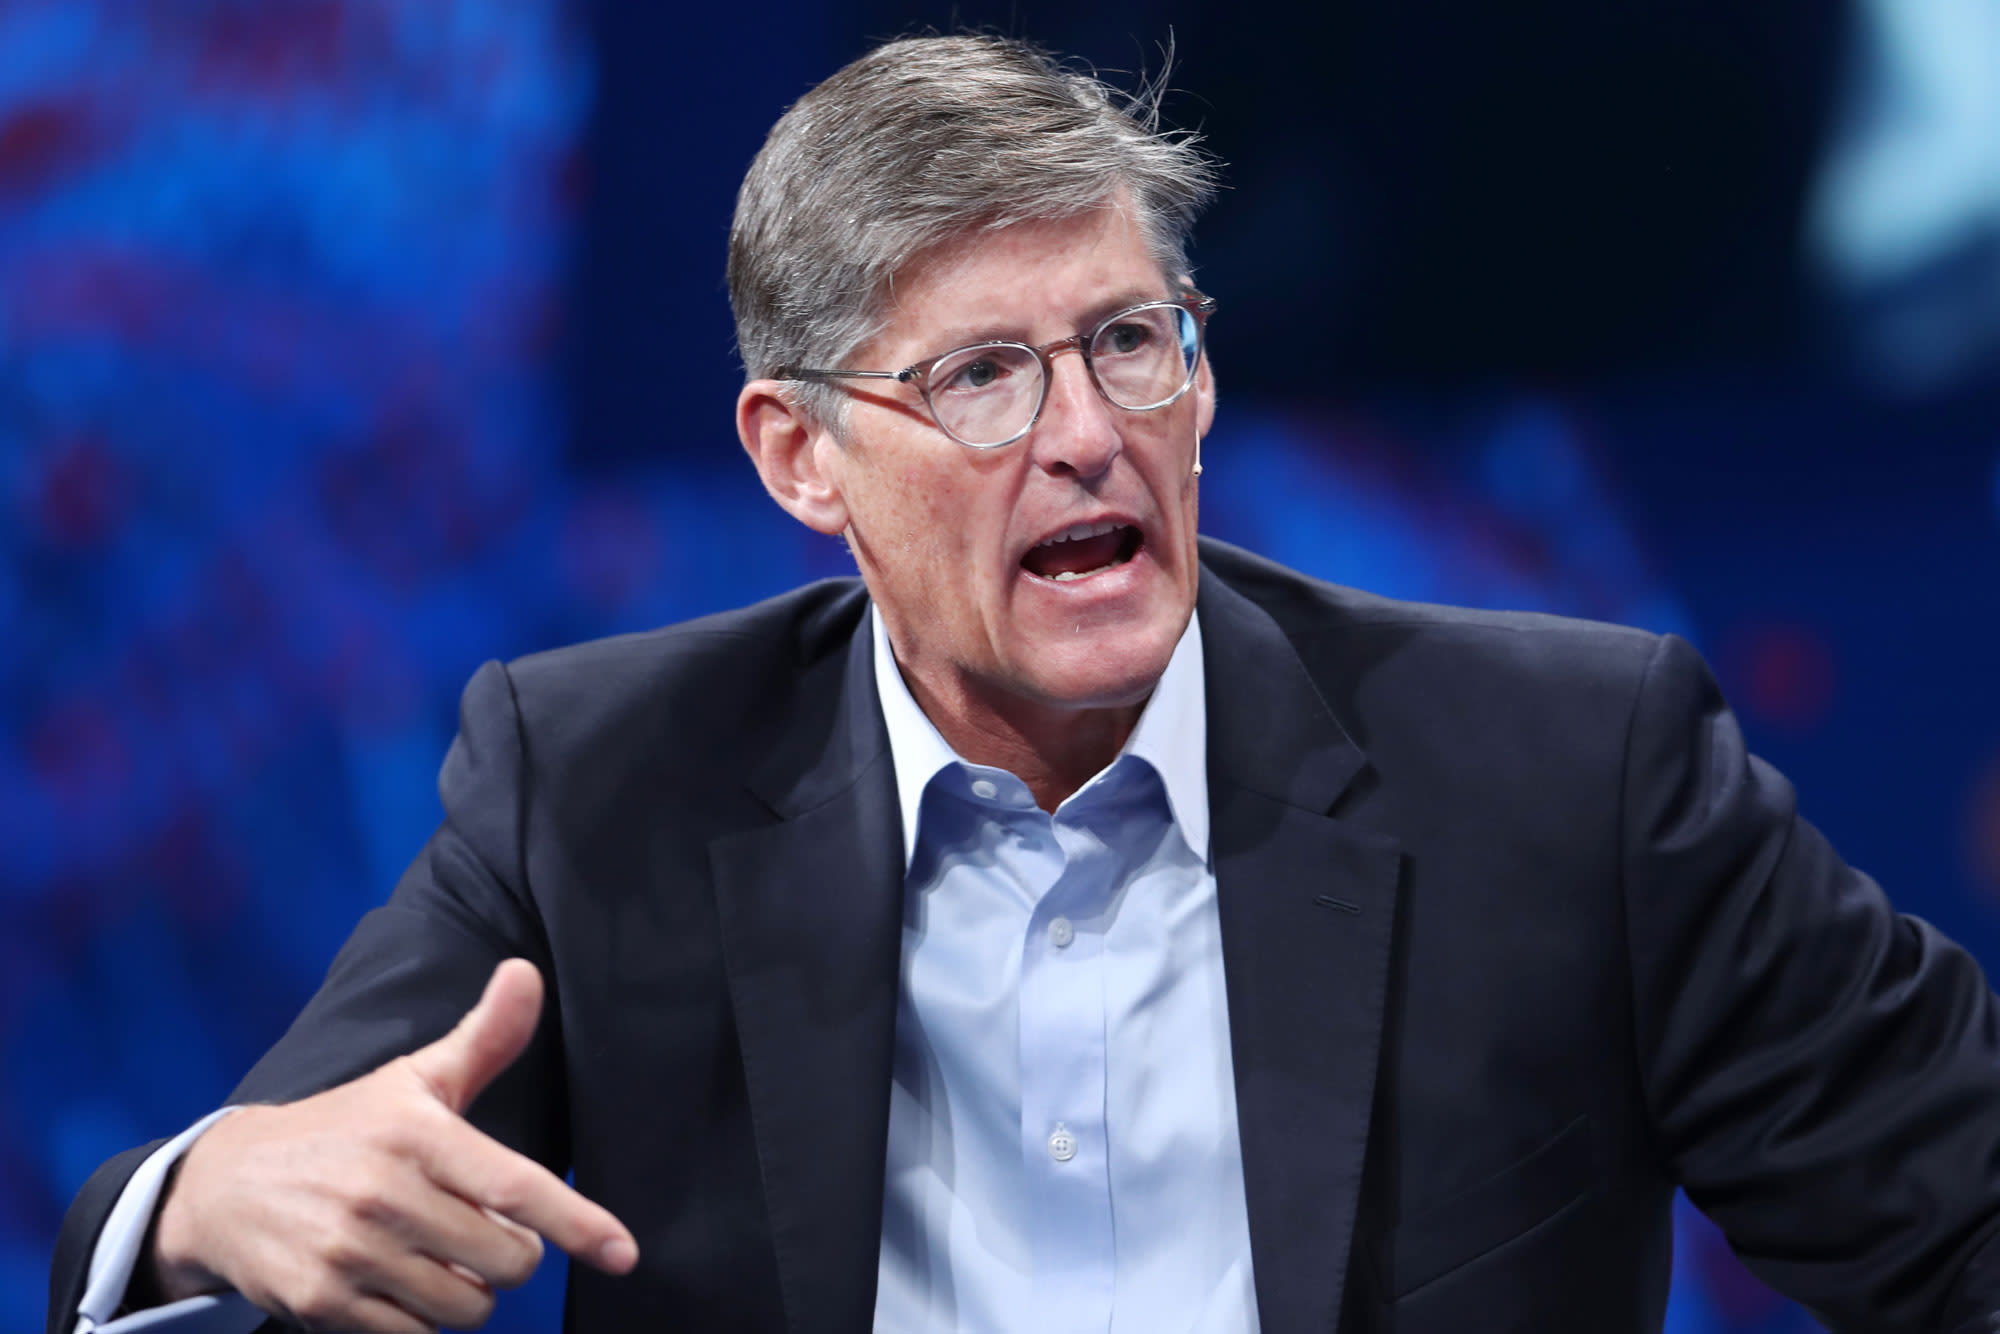 RT: Michael Corbat, CEO of Citigroup 180430